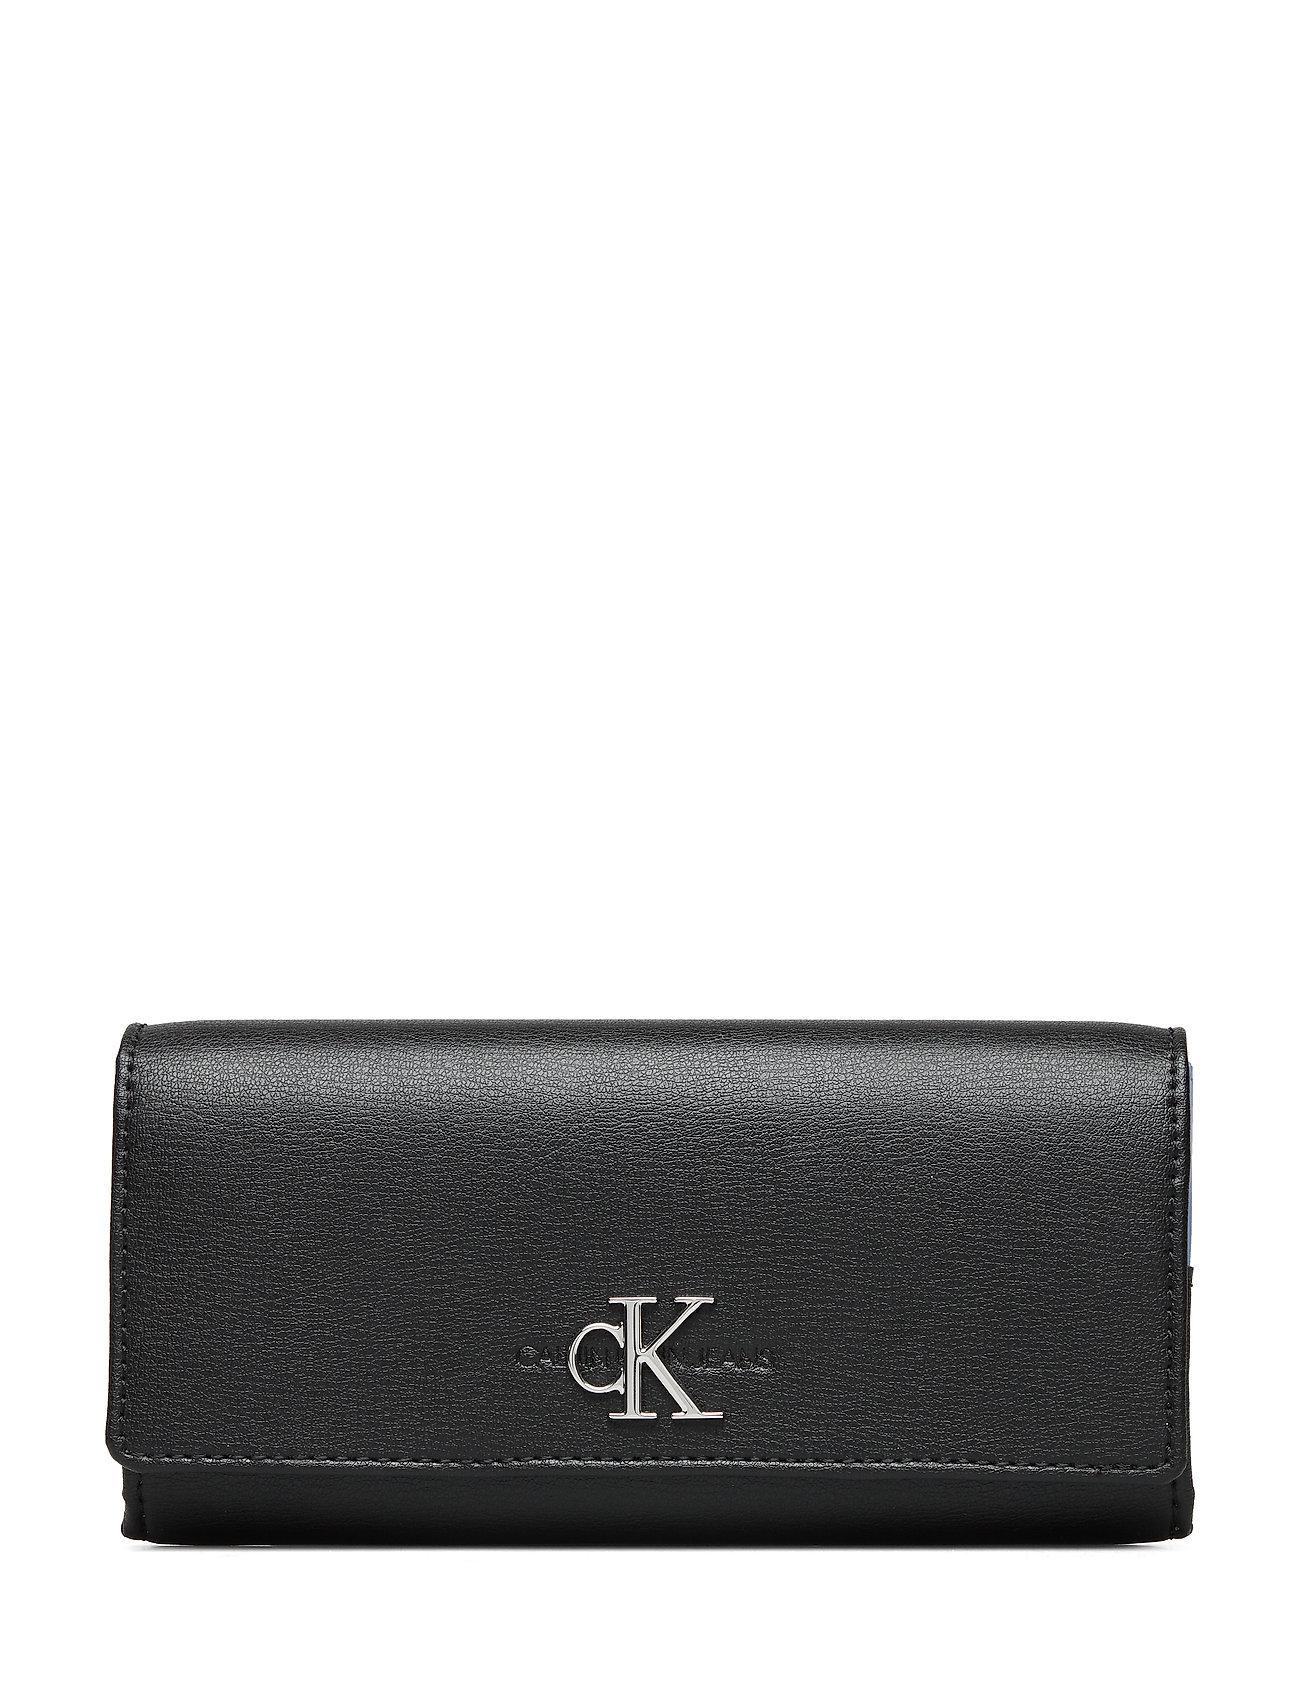 Calvin Klein CKJ MONOGRAM HW LONG - BLACK